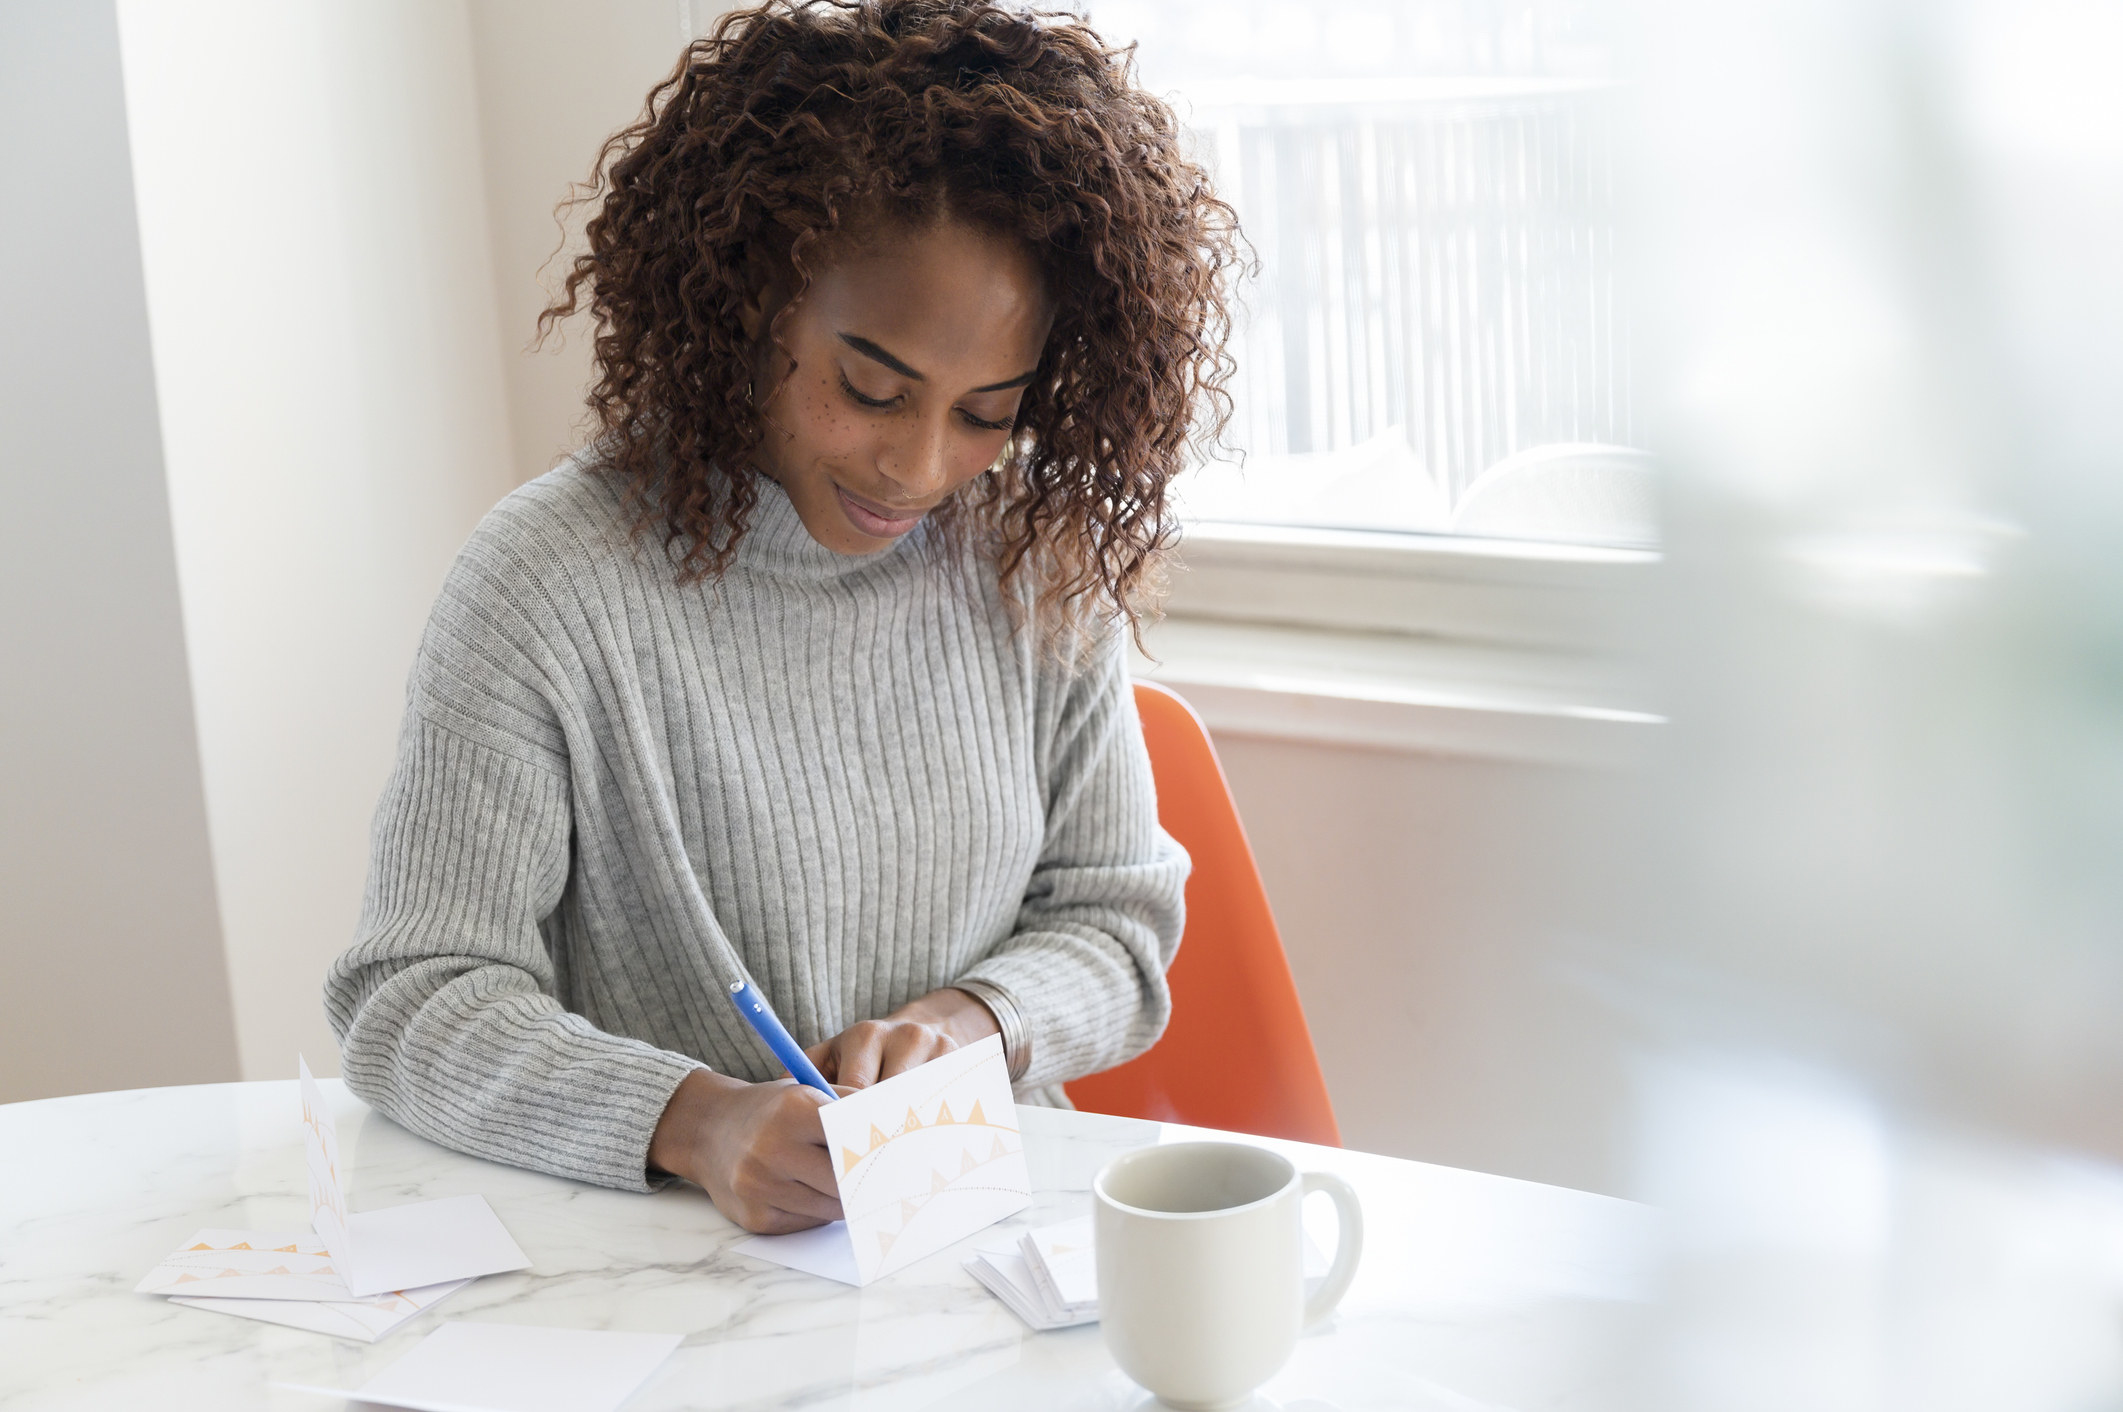 Woman writing a greeting card